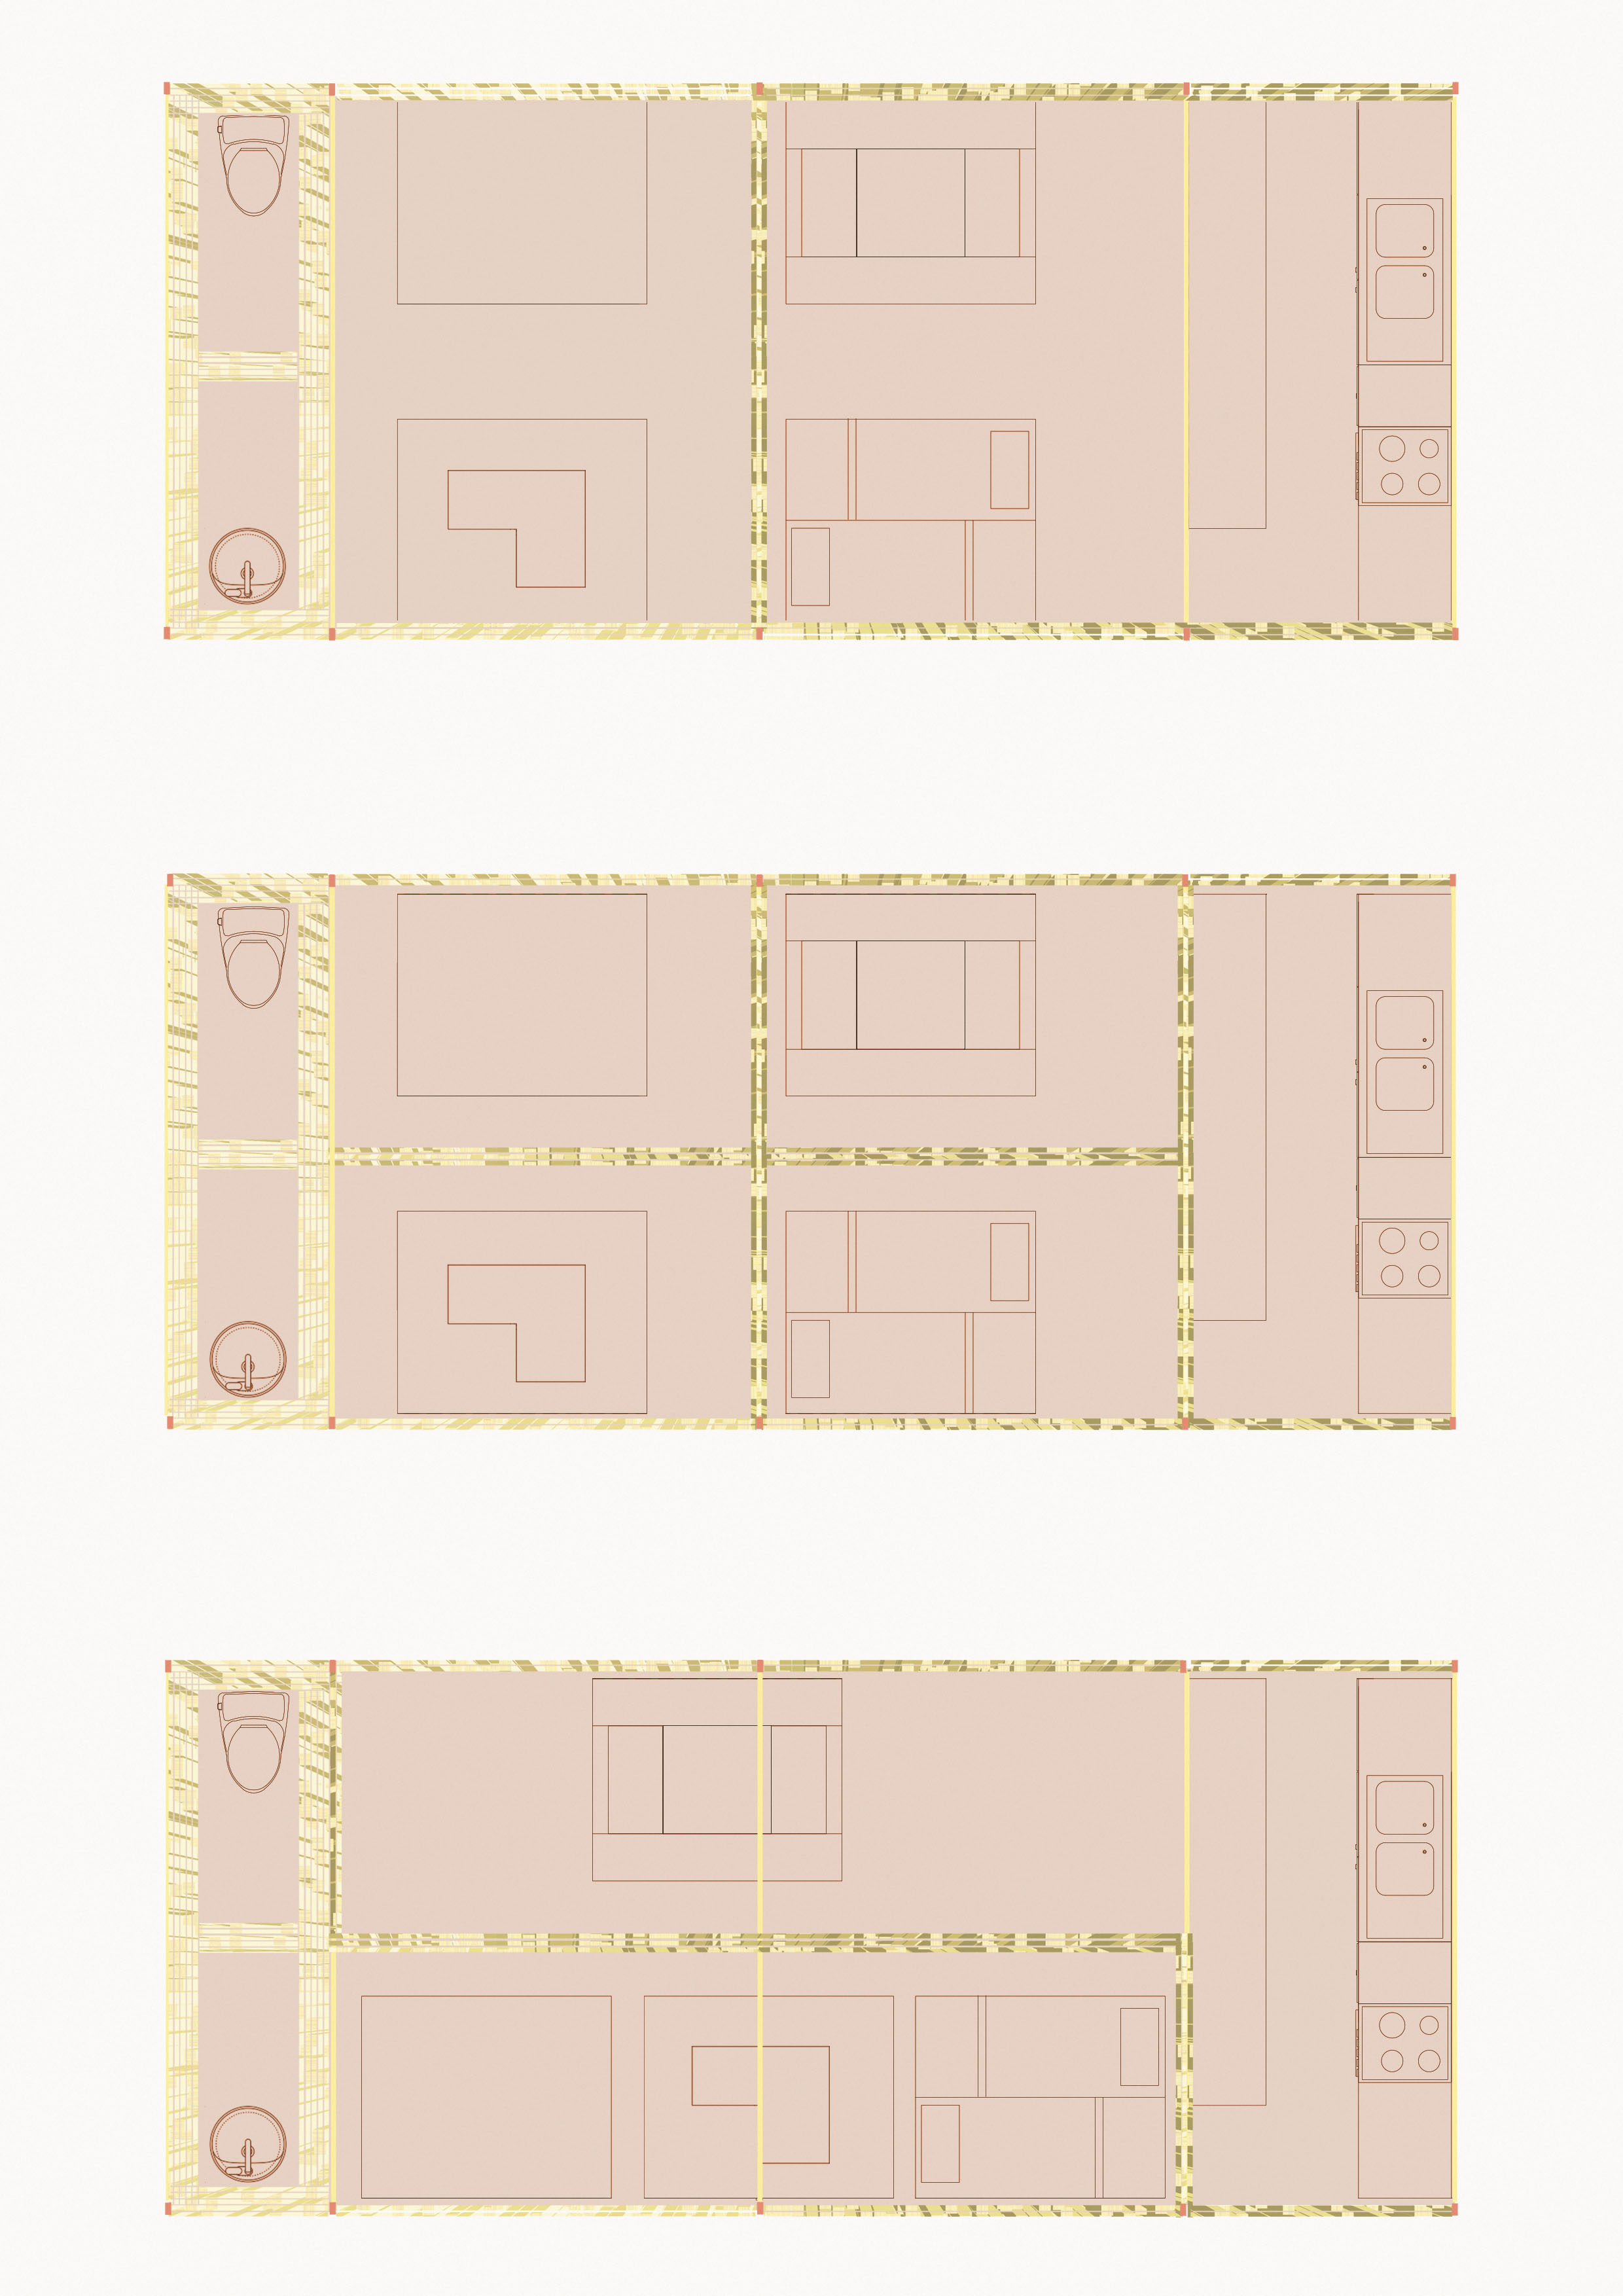 plans-small.jpg